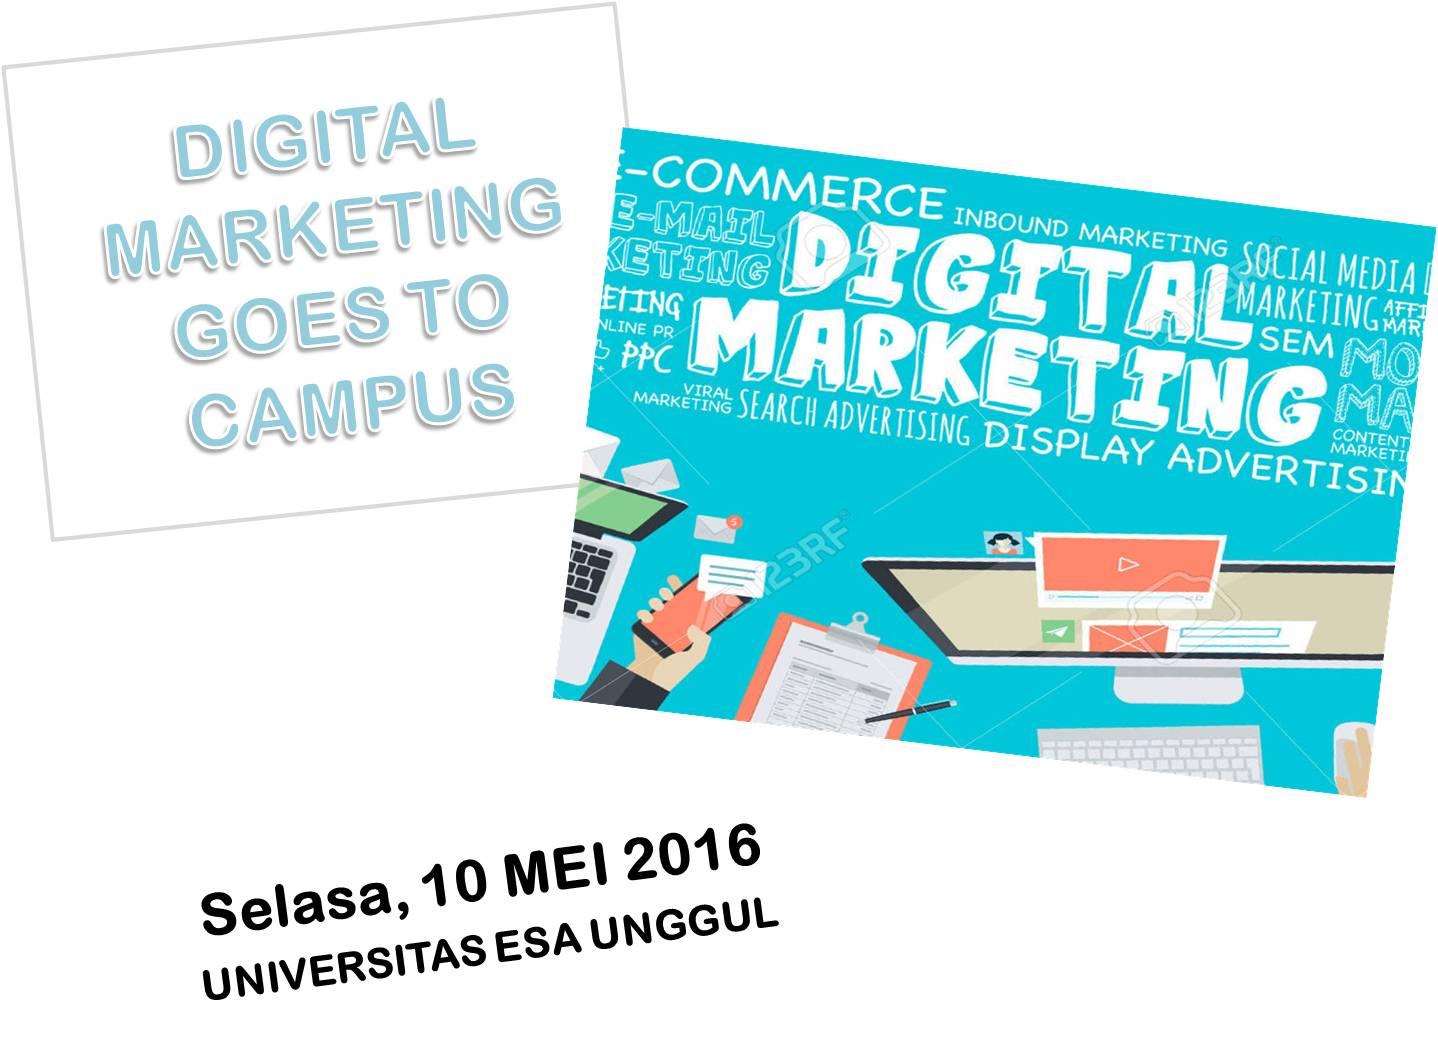 Digital Marketing Workshop for Student & Public at Esa Unggul University